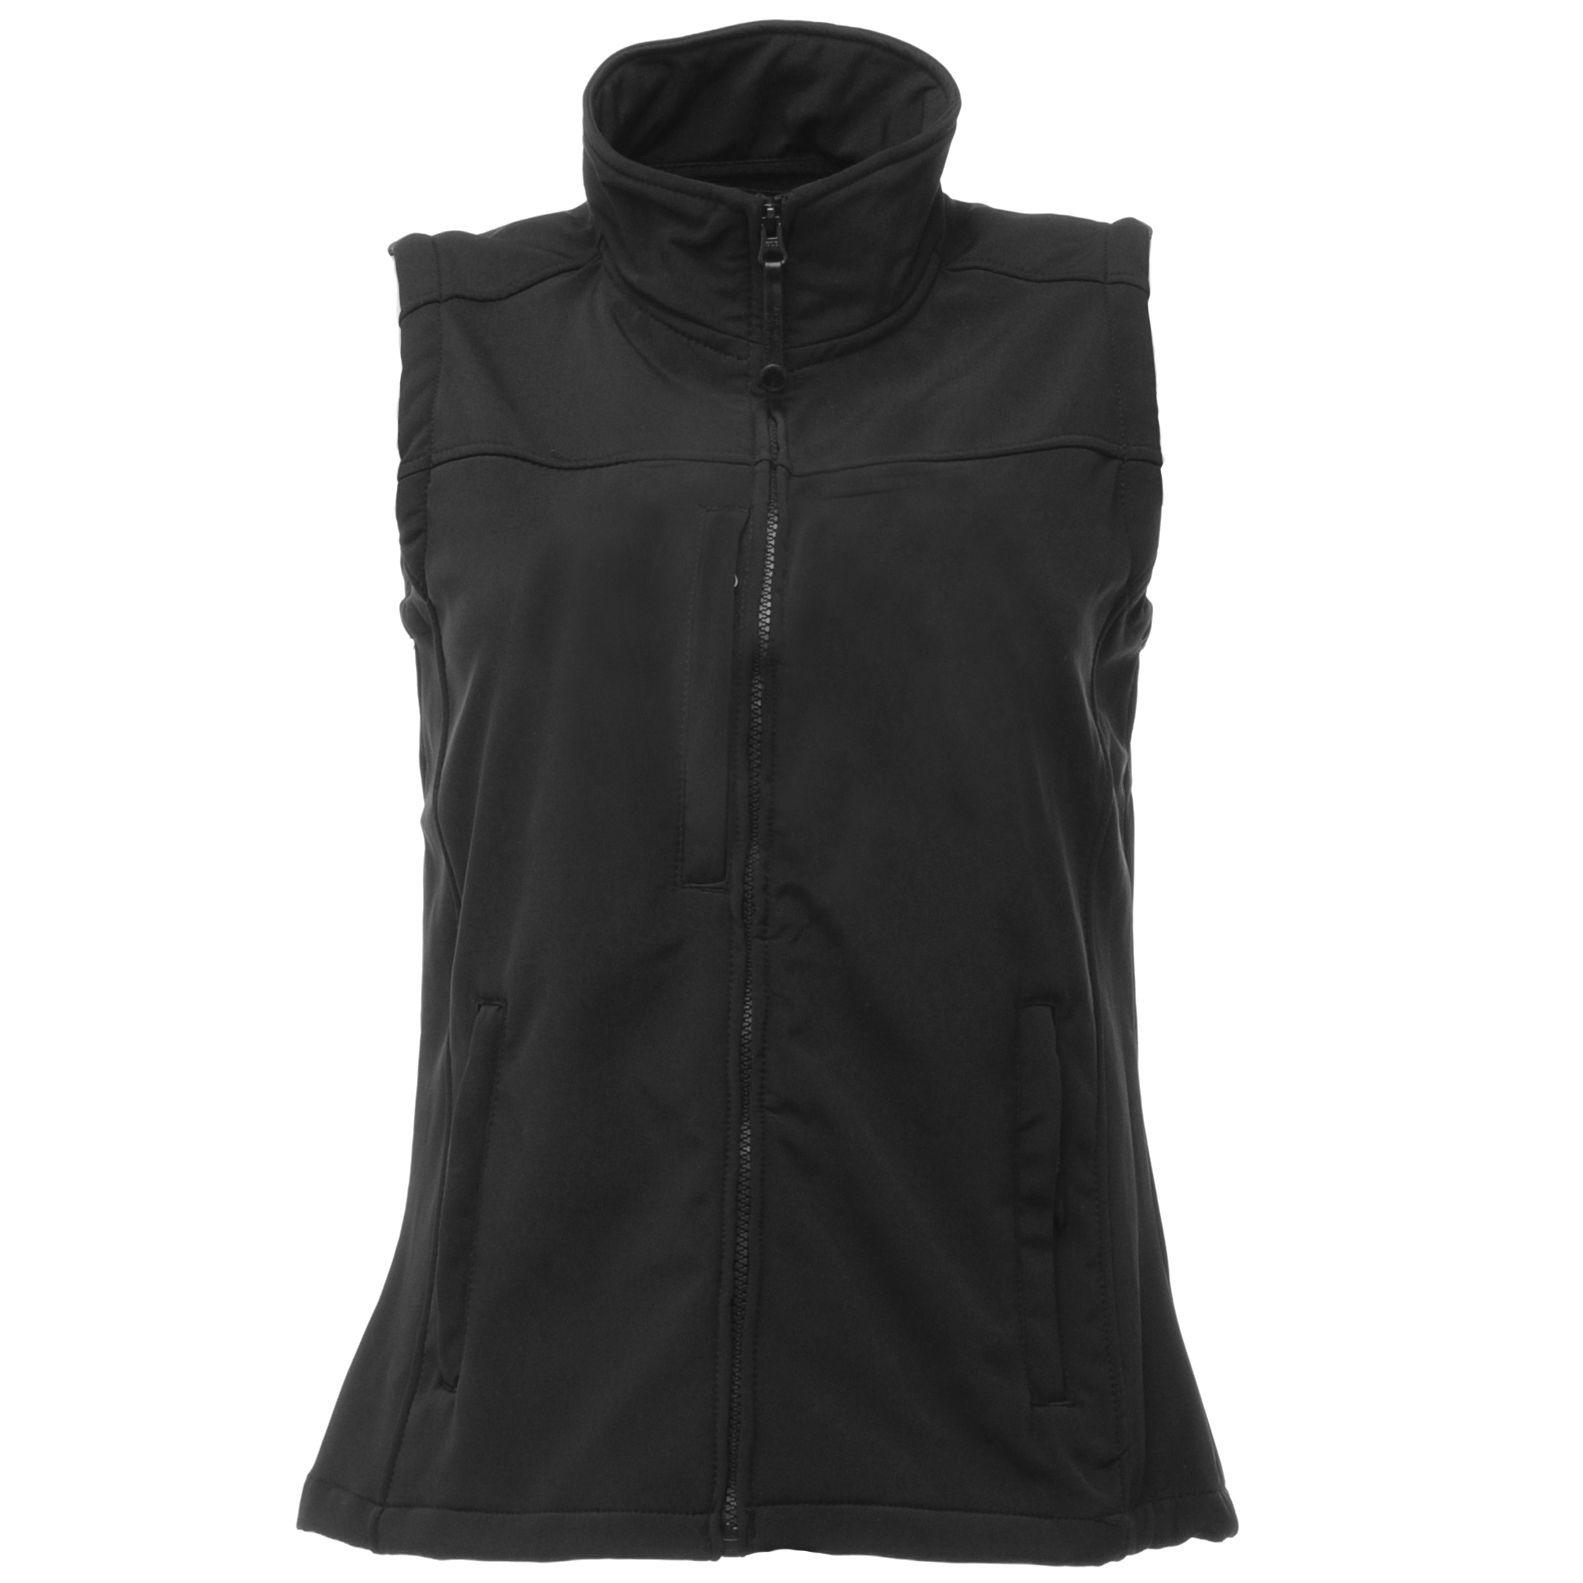 Regatta Womens/Ladies Flux Softshell Bodywarmer / Sleeveless Jacket (Water Repellent & Wind Resistant)